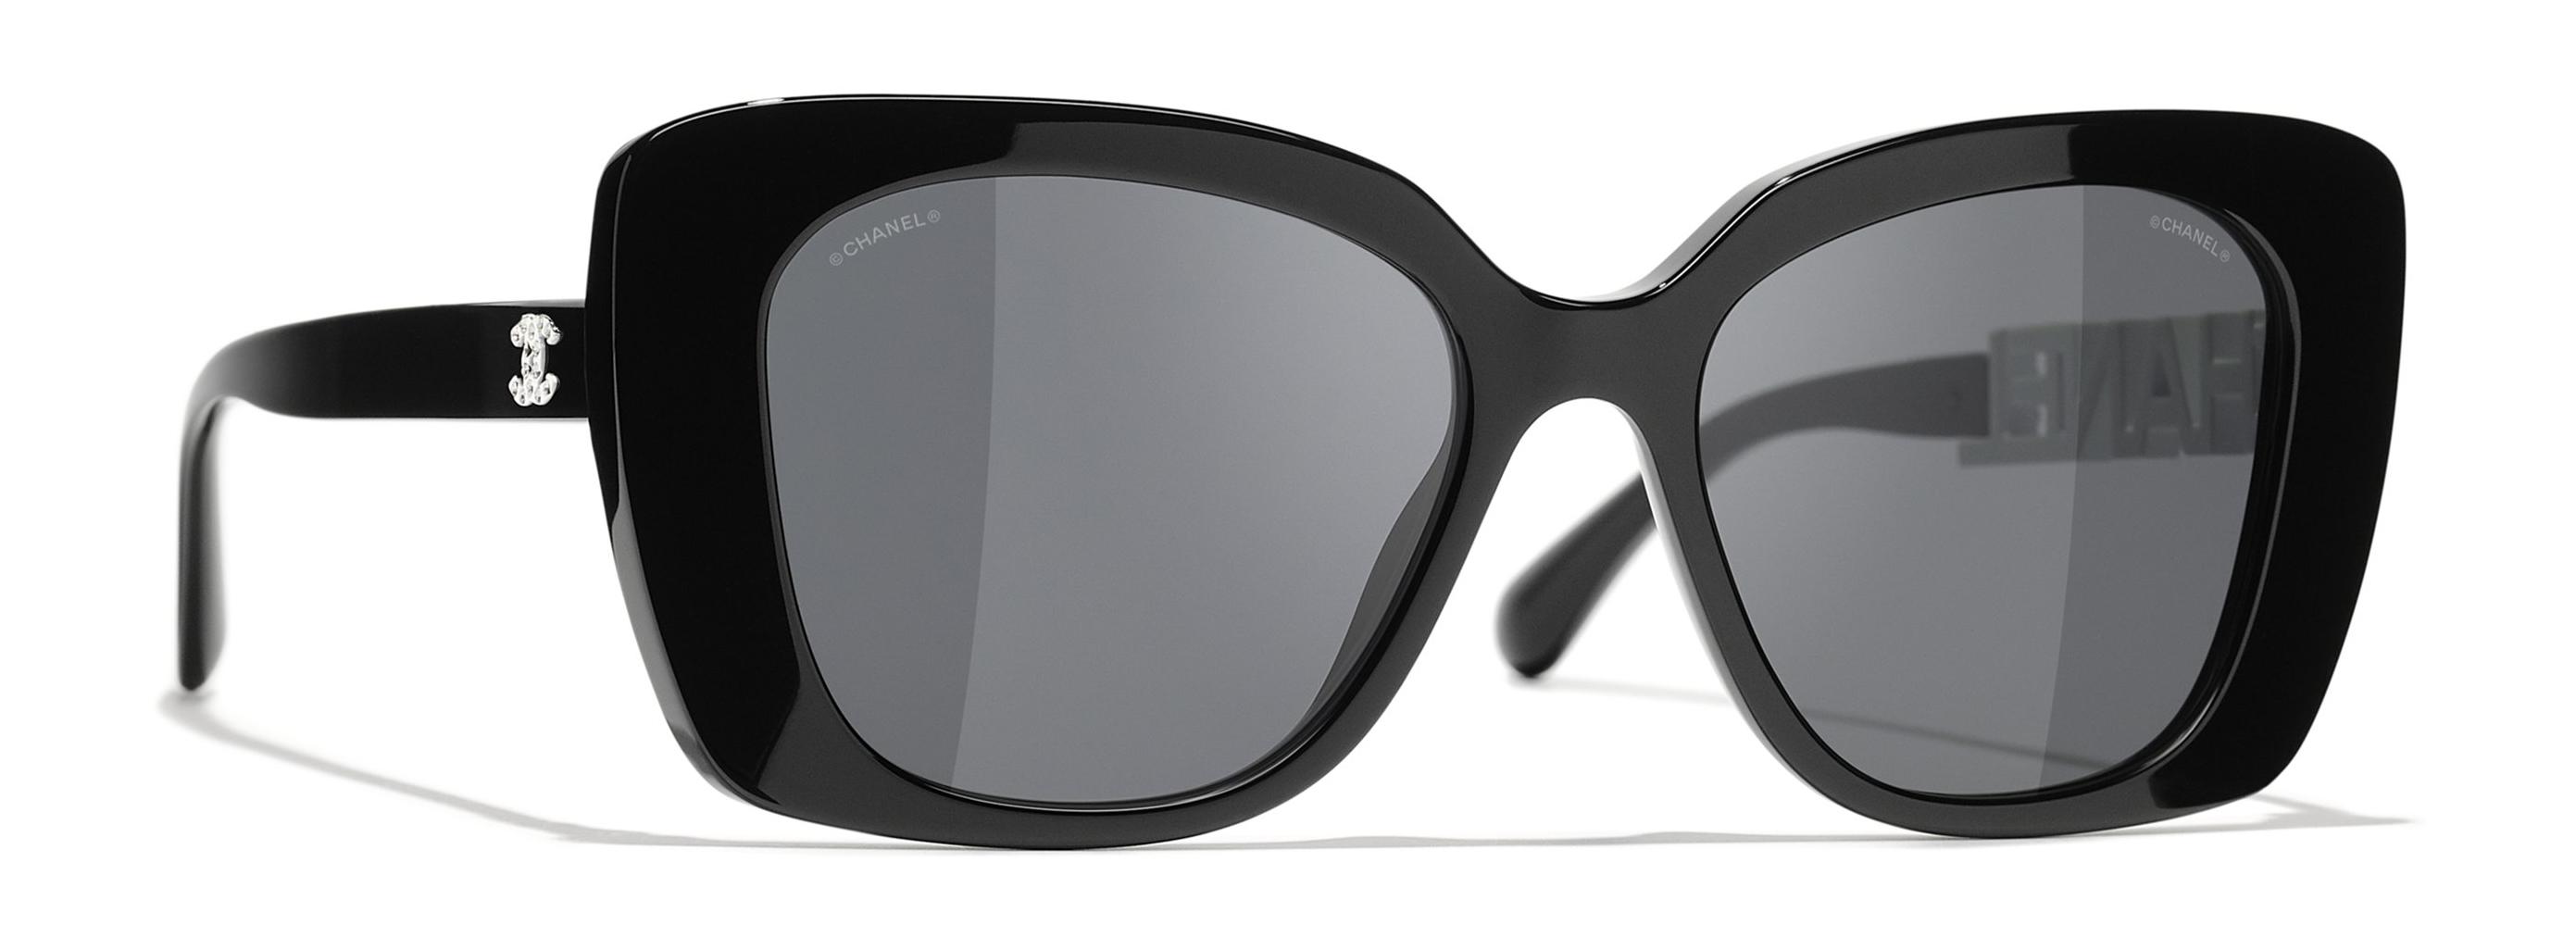 Sunglasses CHANEL CH 5422B 1026S4 53/17